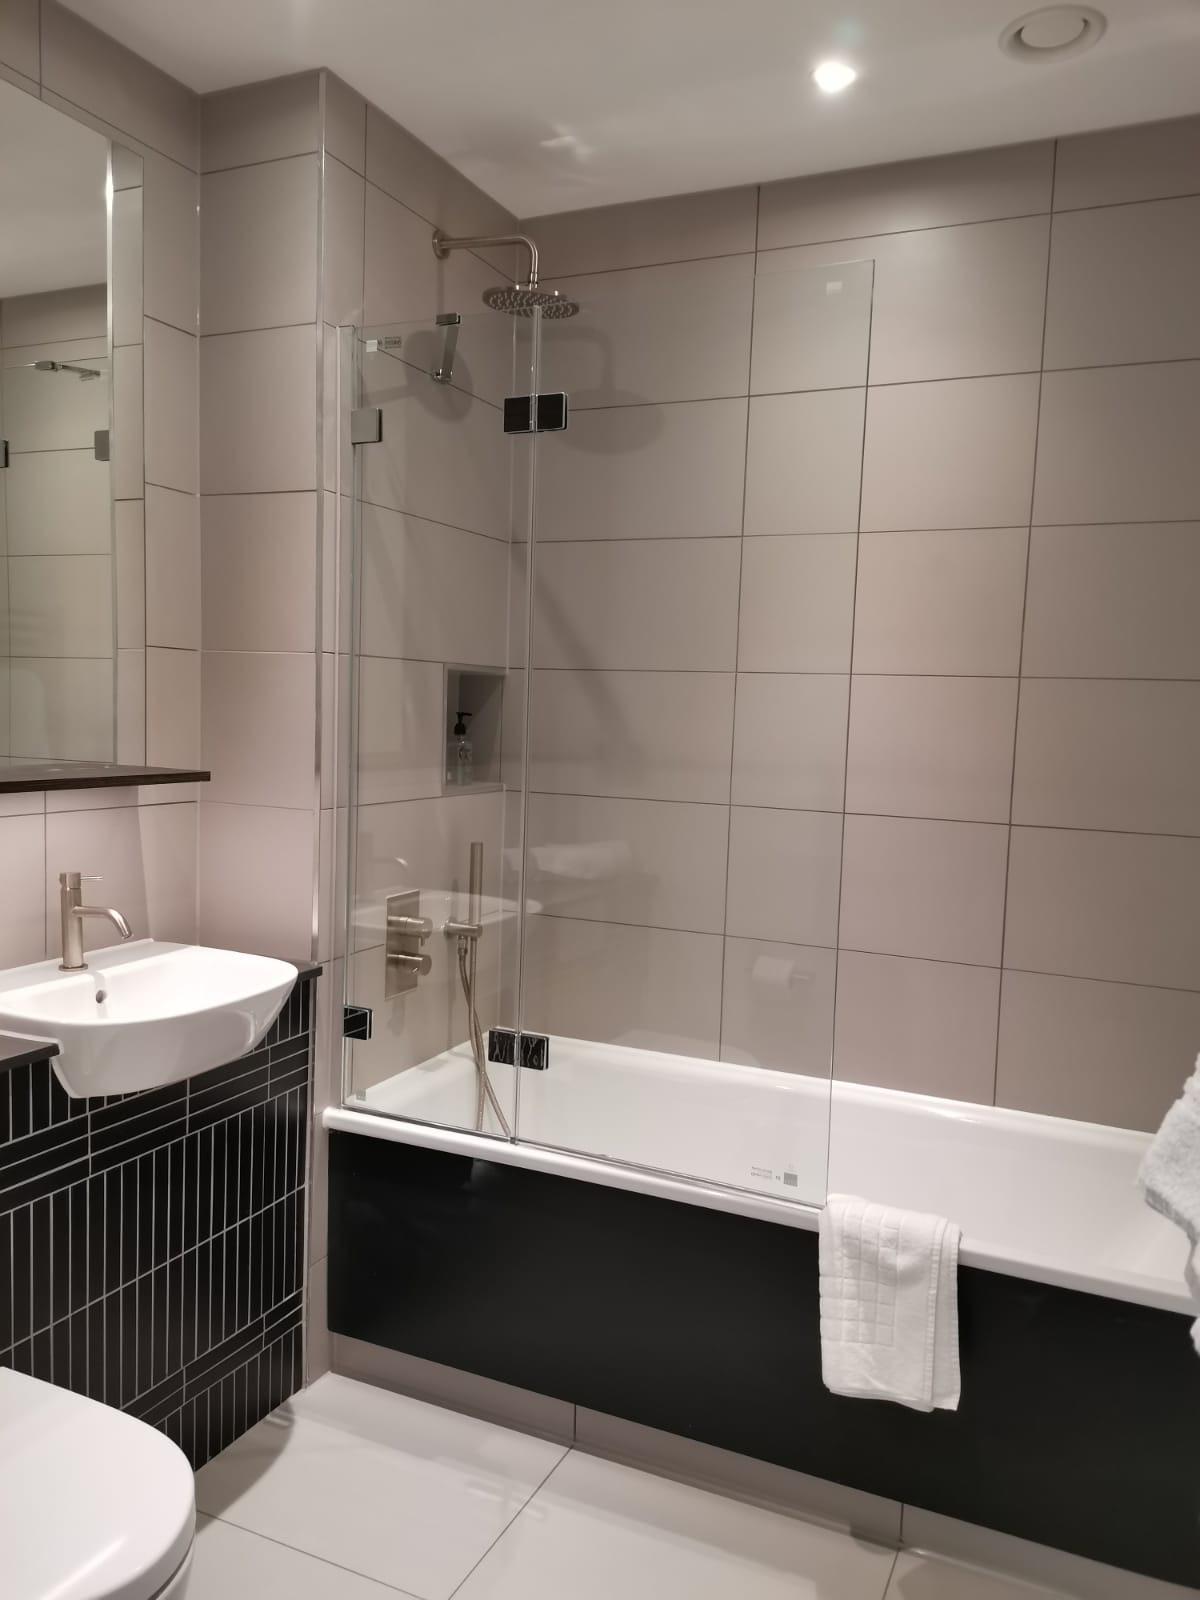 Bathroom at Heathrow North Apartments, Hounslow, London - Citybase Apartments